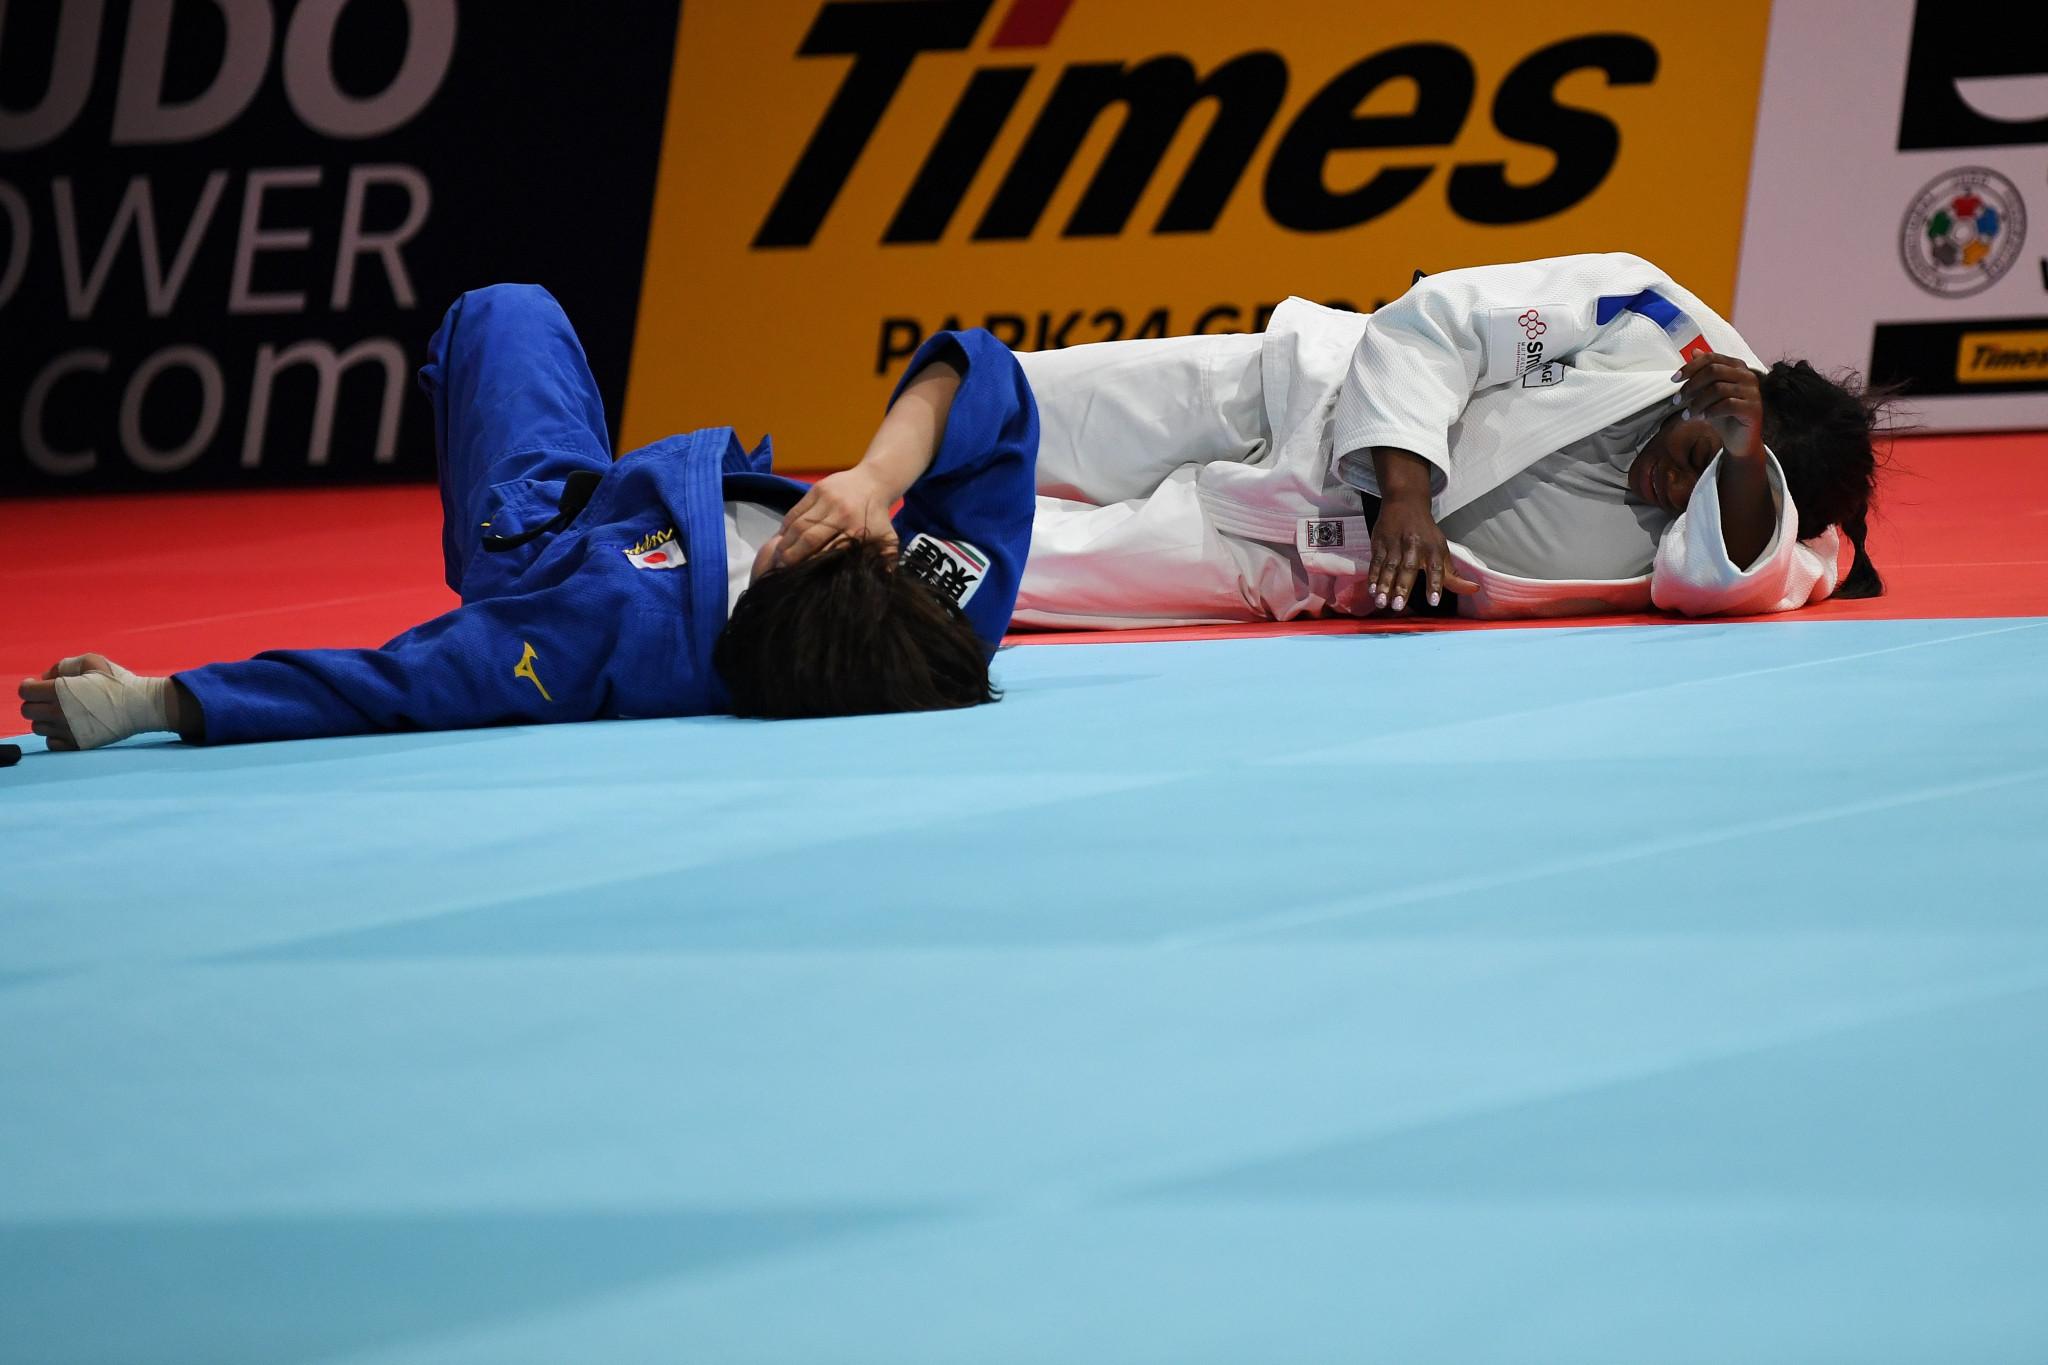 Agbegnenou wins fourth World Judo Championships gold after sensational final